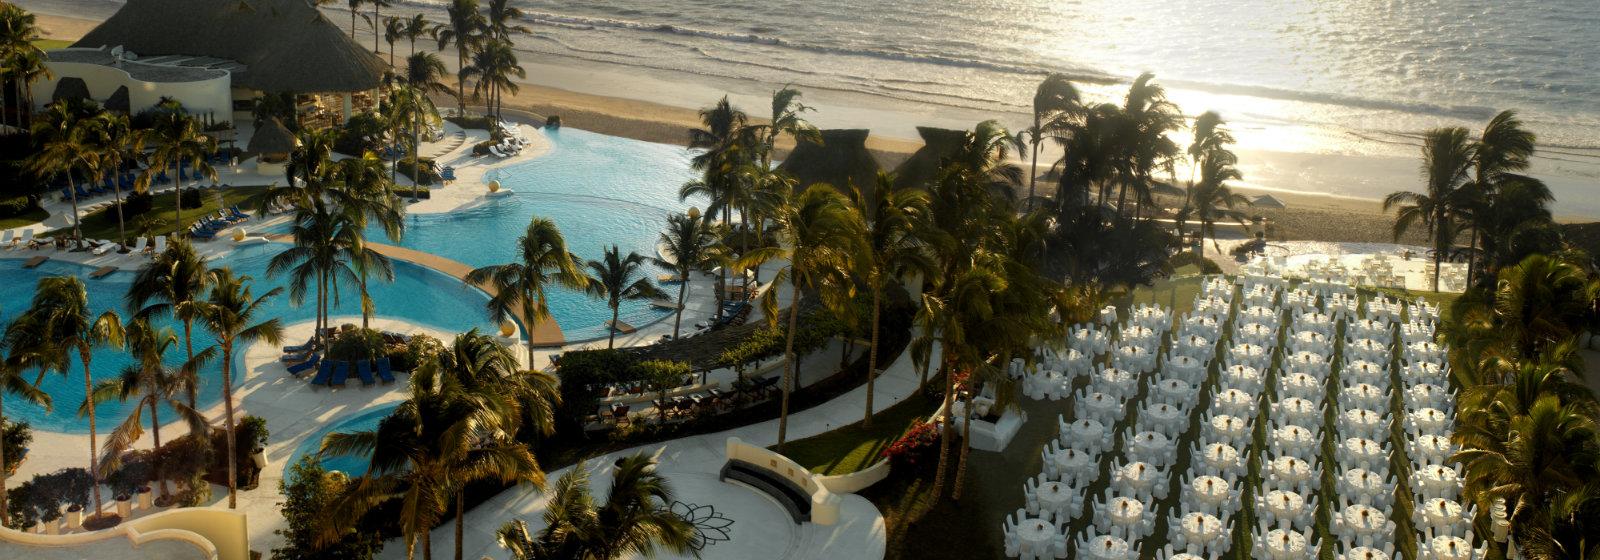 Grand Velas Riviera Nayarit offering Meetings Facilities